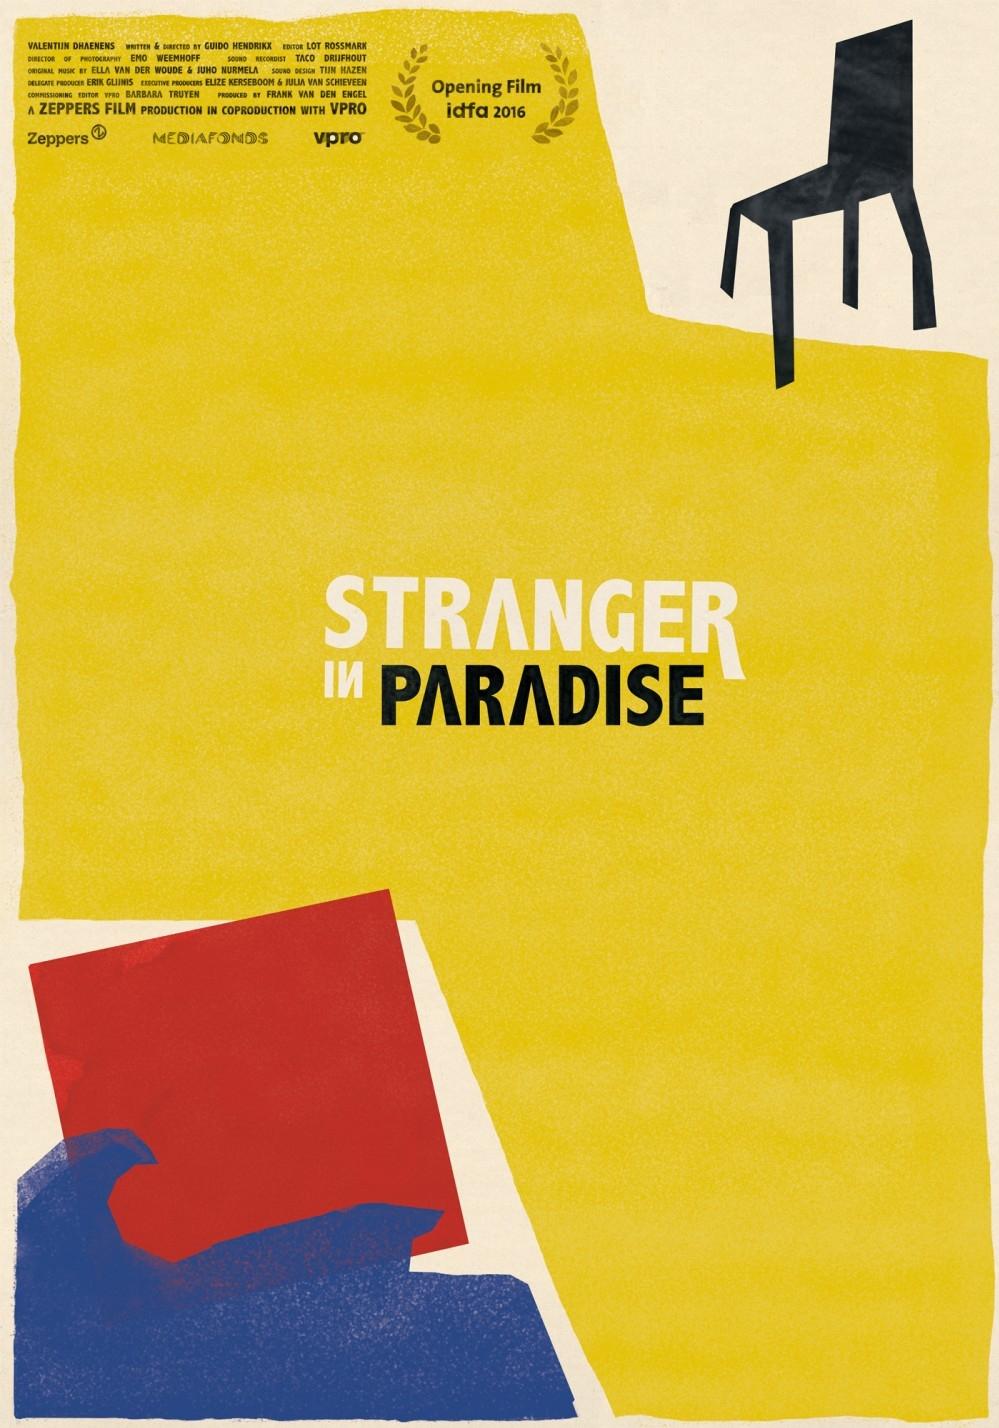 Stranger In Paradise poster, © 2016 Cinema Delicatessen